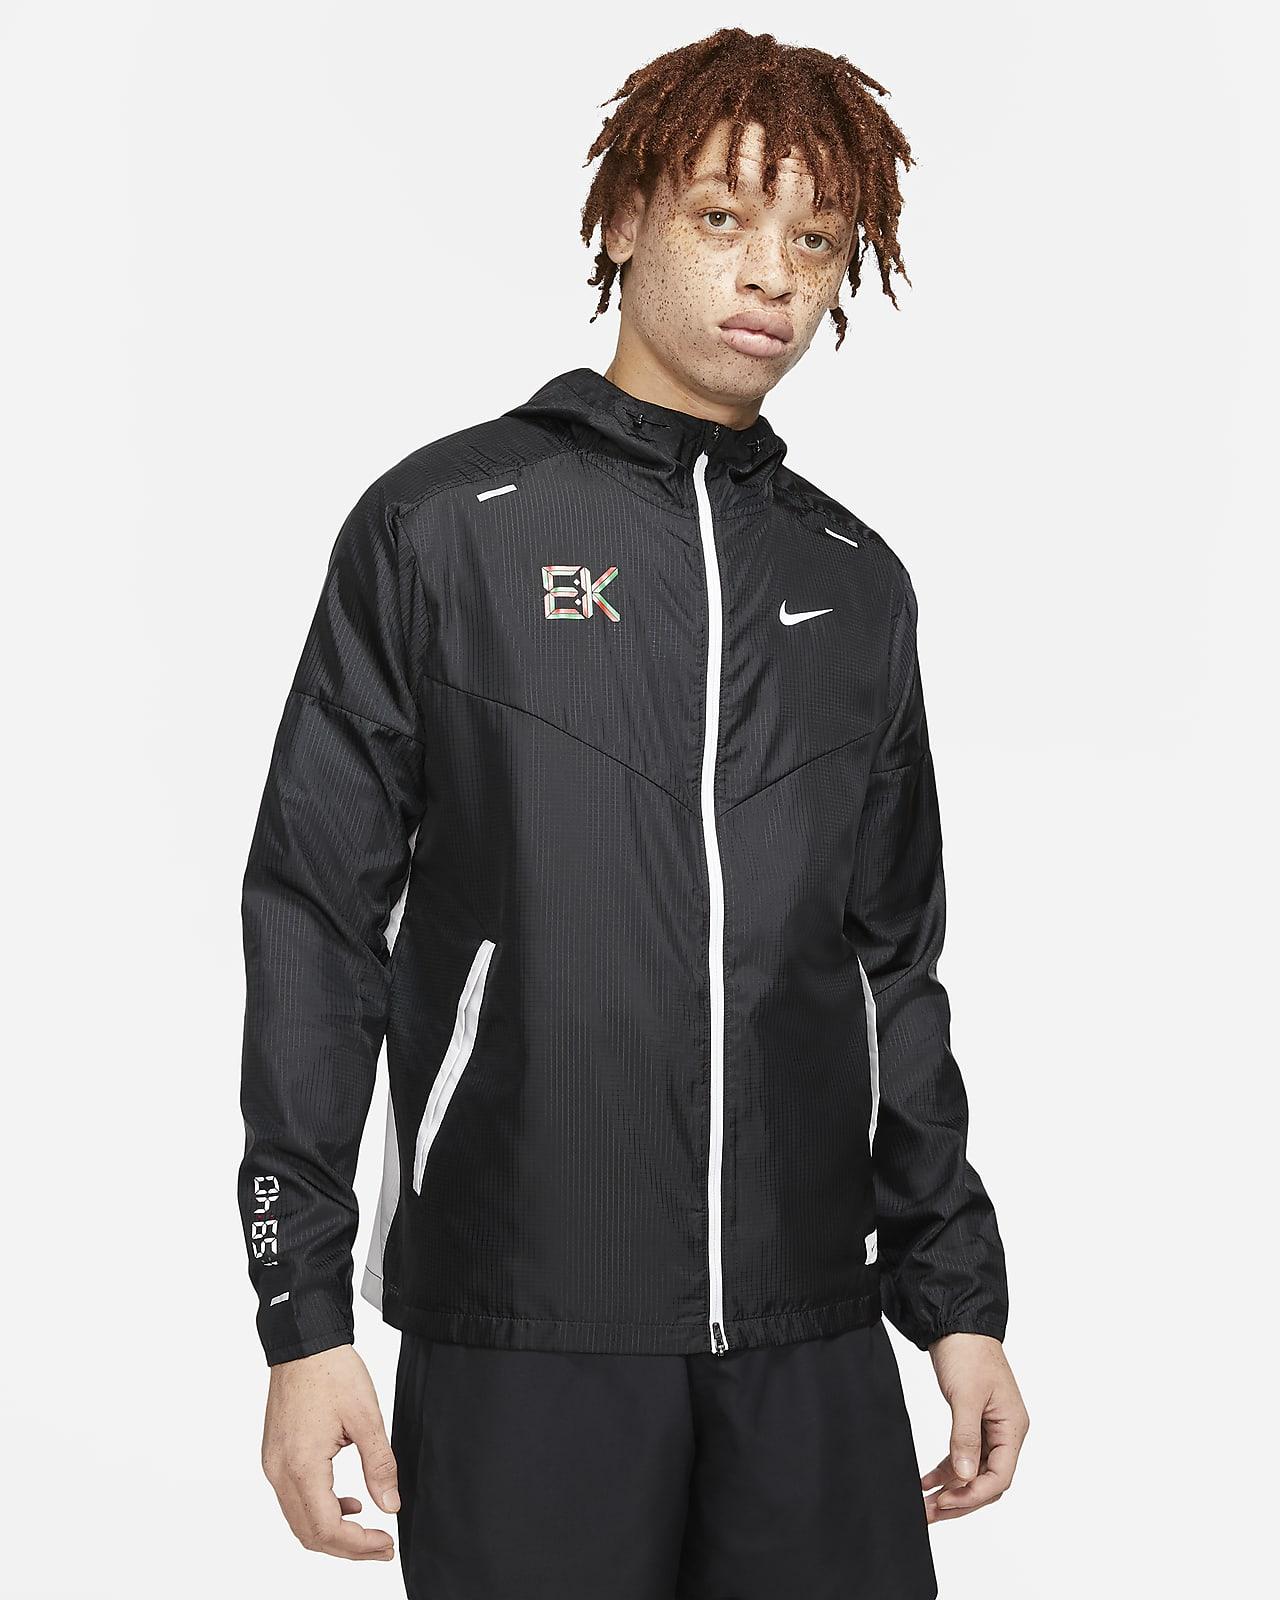 Giacca da running Nike Windrunner Eliud Kipchoge - Uomo